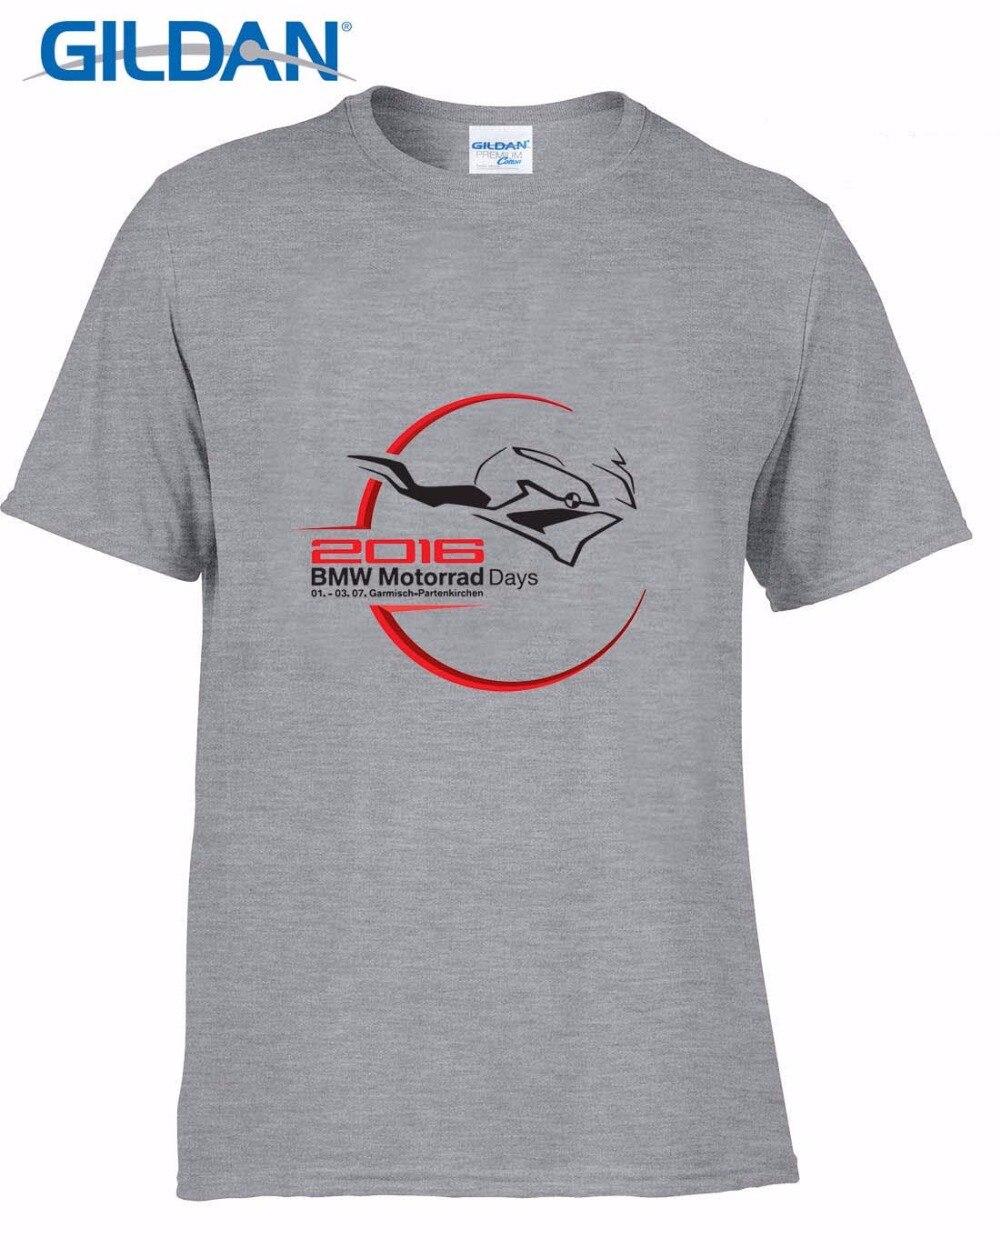 Us 14 24 5 Off Brand Man T Shirt 2019 New Brand T Shirt 100 Cotton Clothes New 2016 1200gs Motorrad Days Garnish Partenkirchen Tee Shirt In